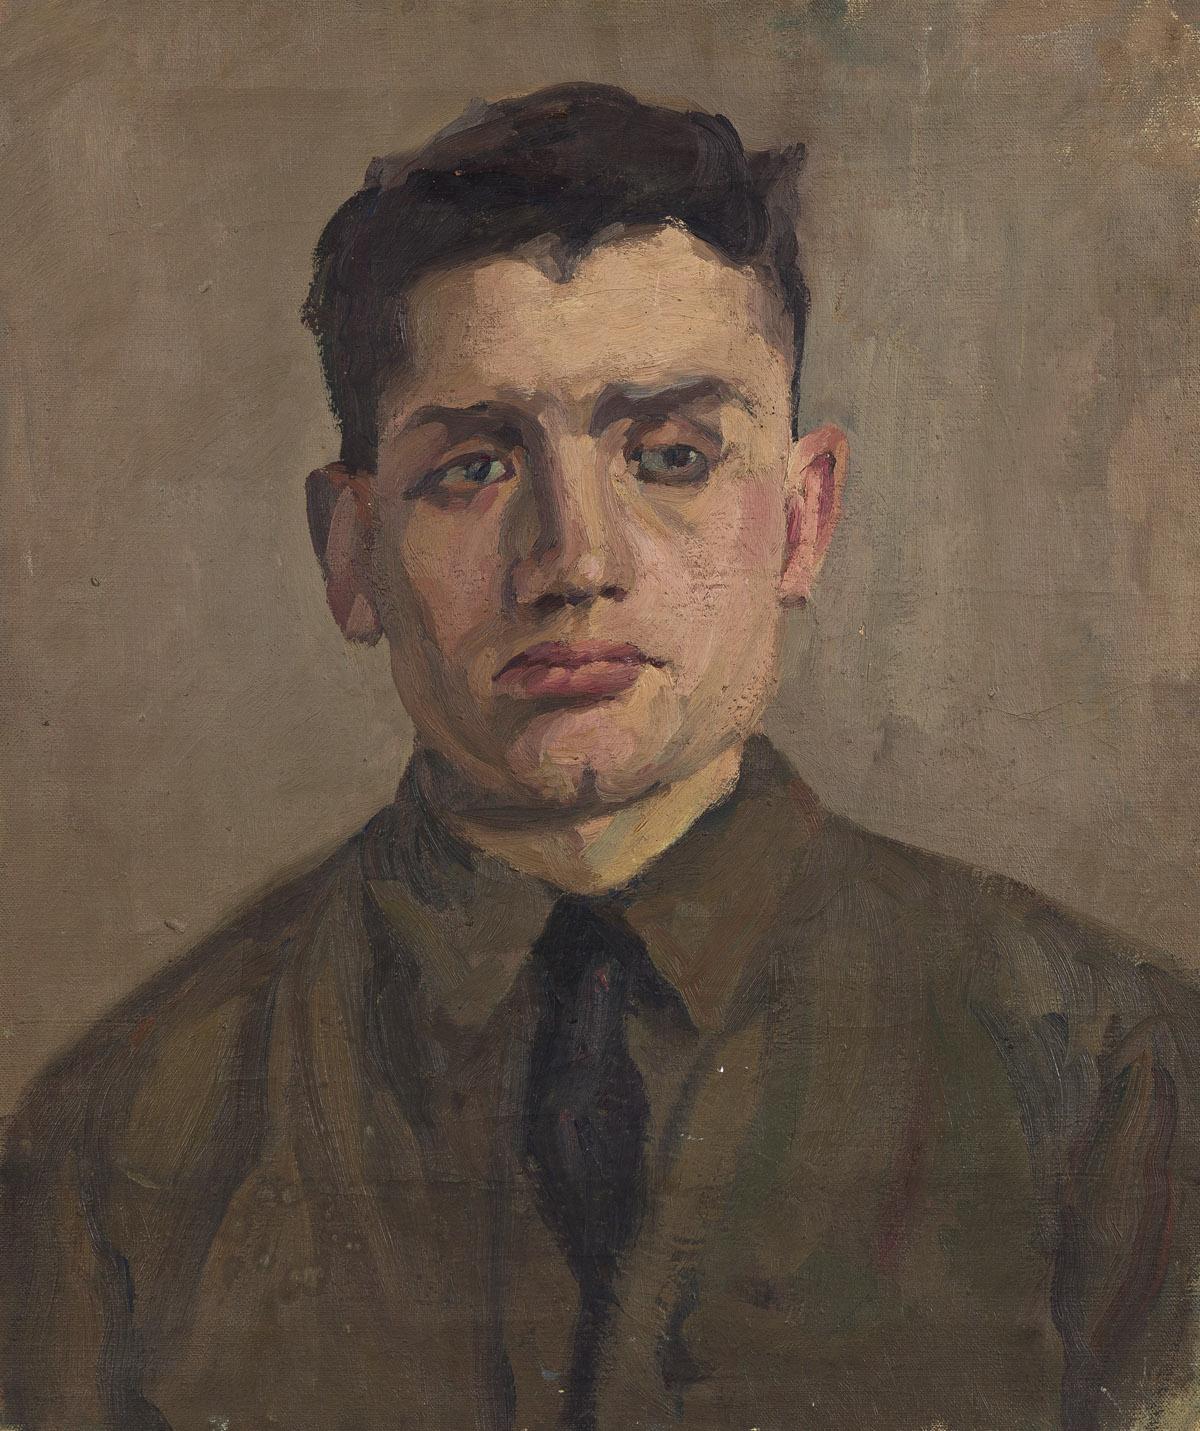 EUGENIE BAIZERMAN (1899-1949) Young Artist (Portrait of Saul Baizerman).